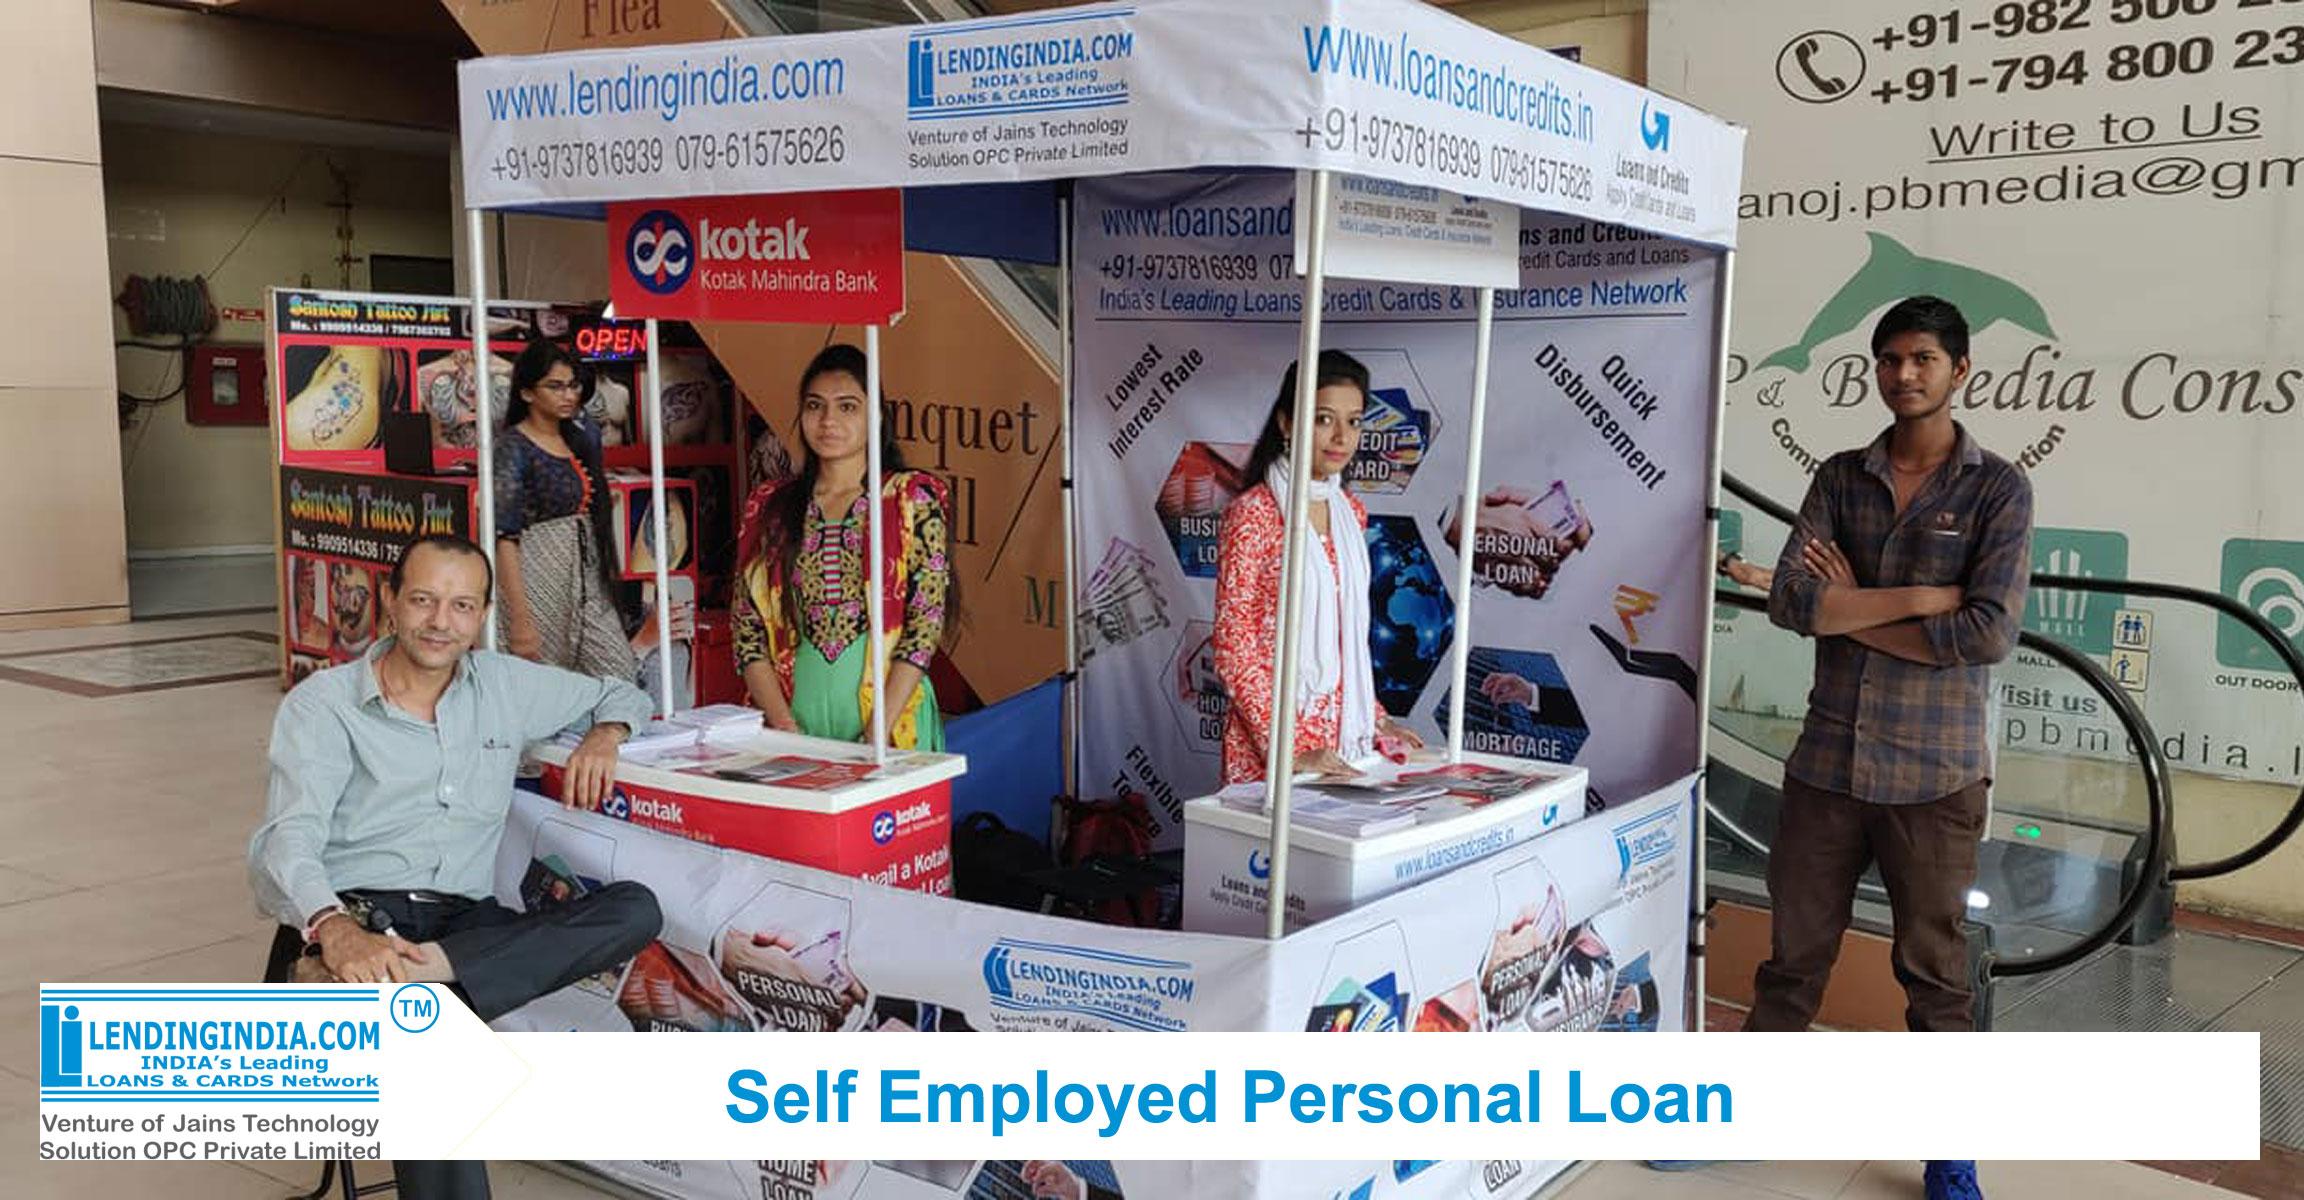 lending india self employed personal loan